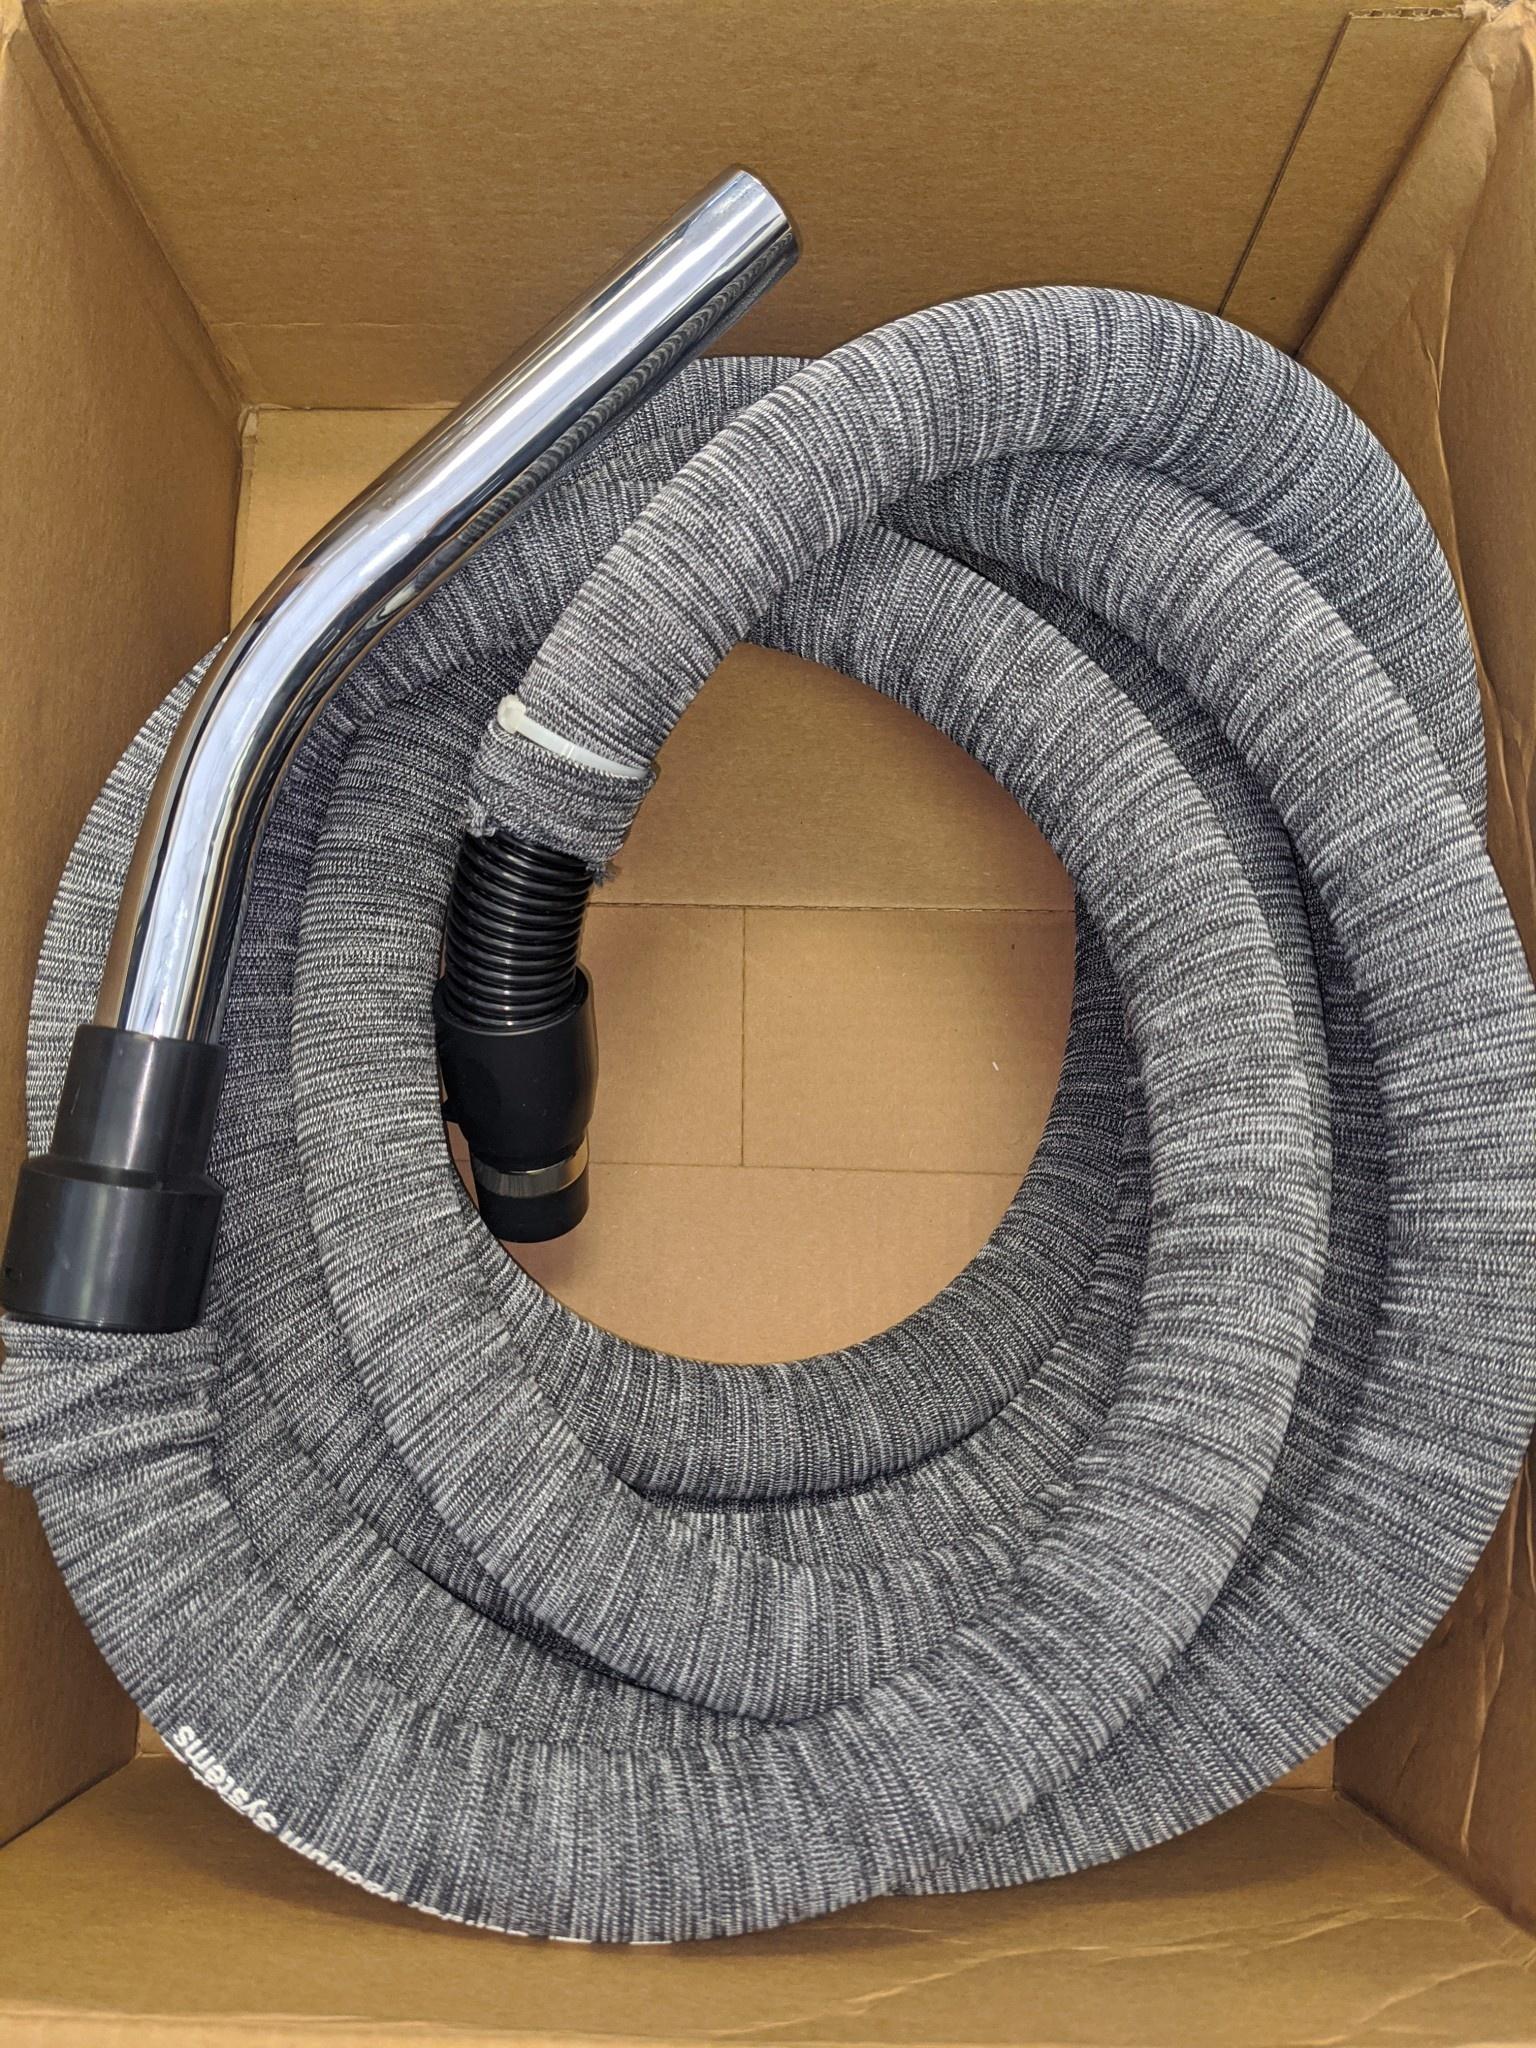 Swiss Boy Vacuum Refurbished Suction Only 30' Hose w/ Hose Sock